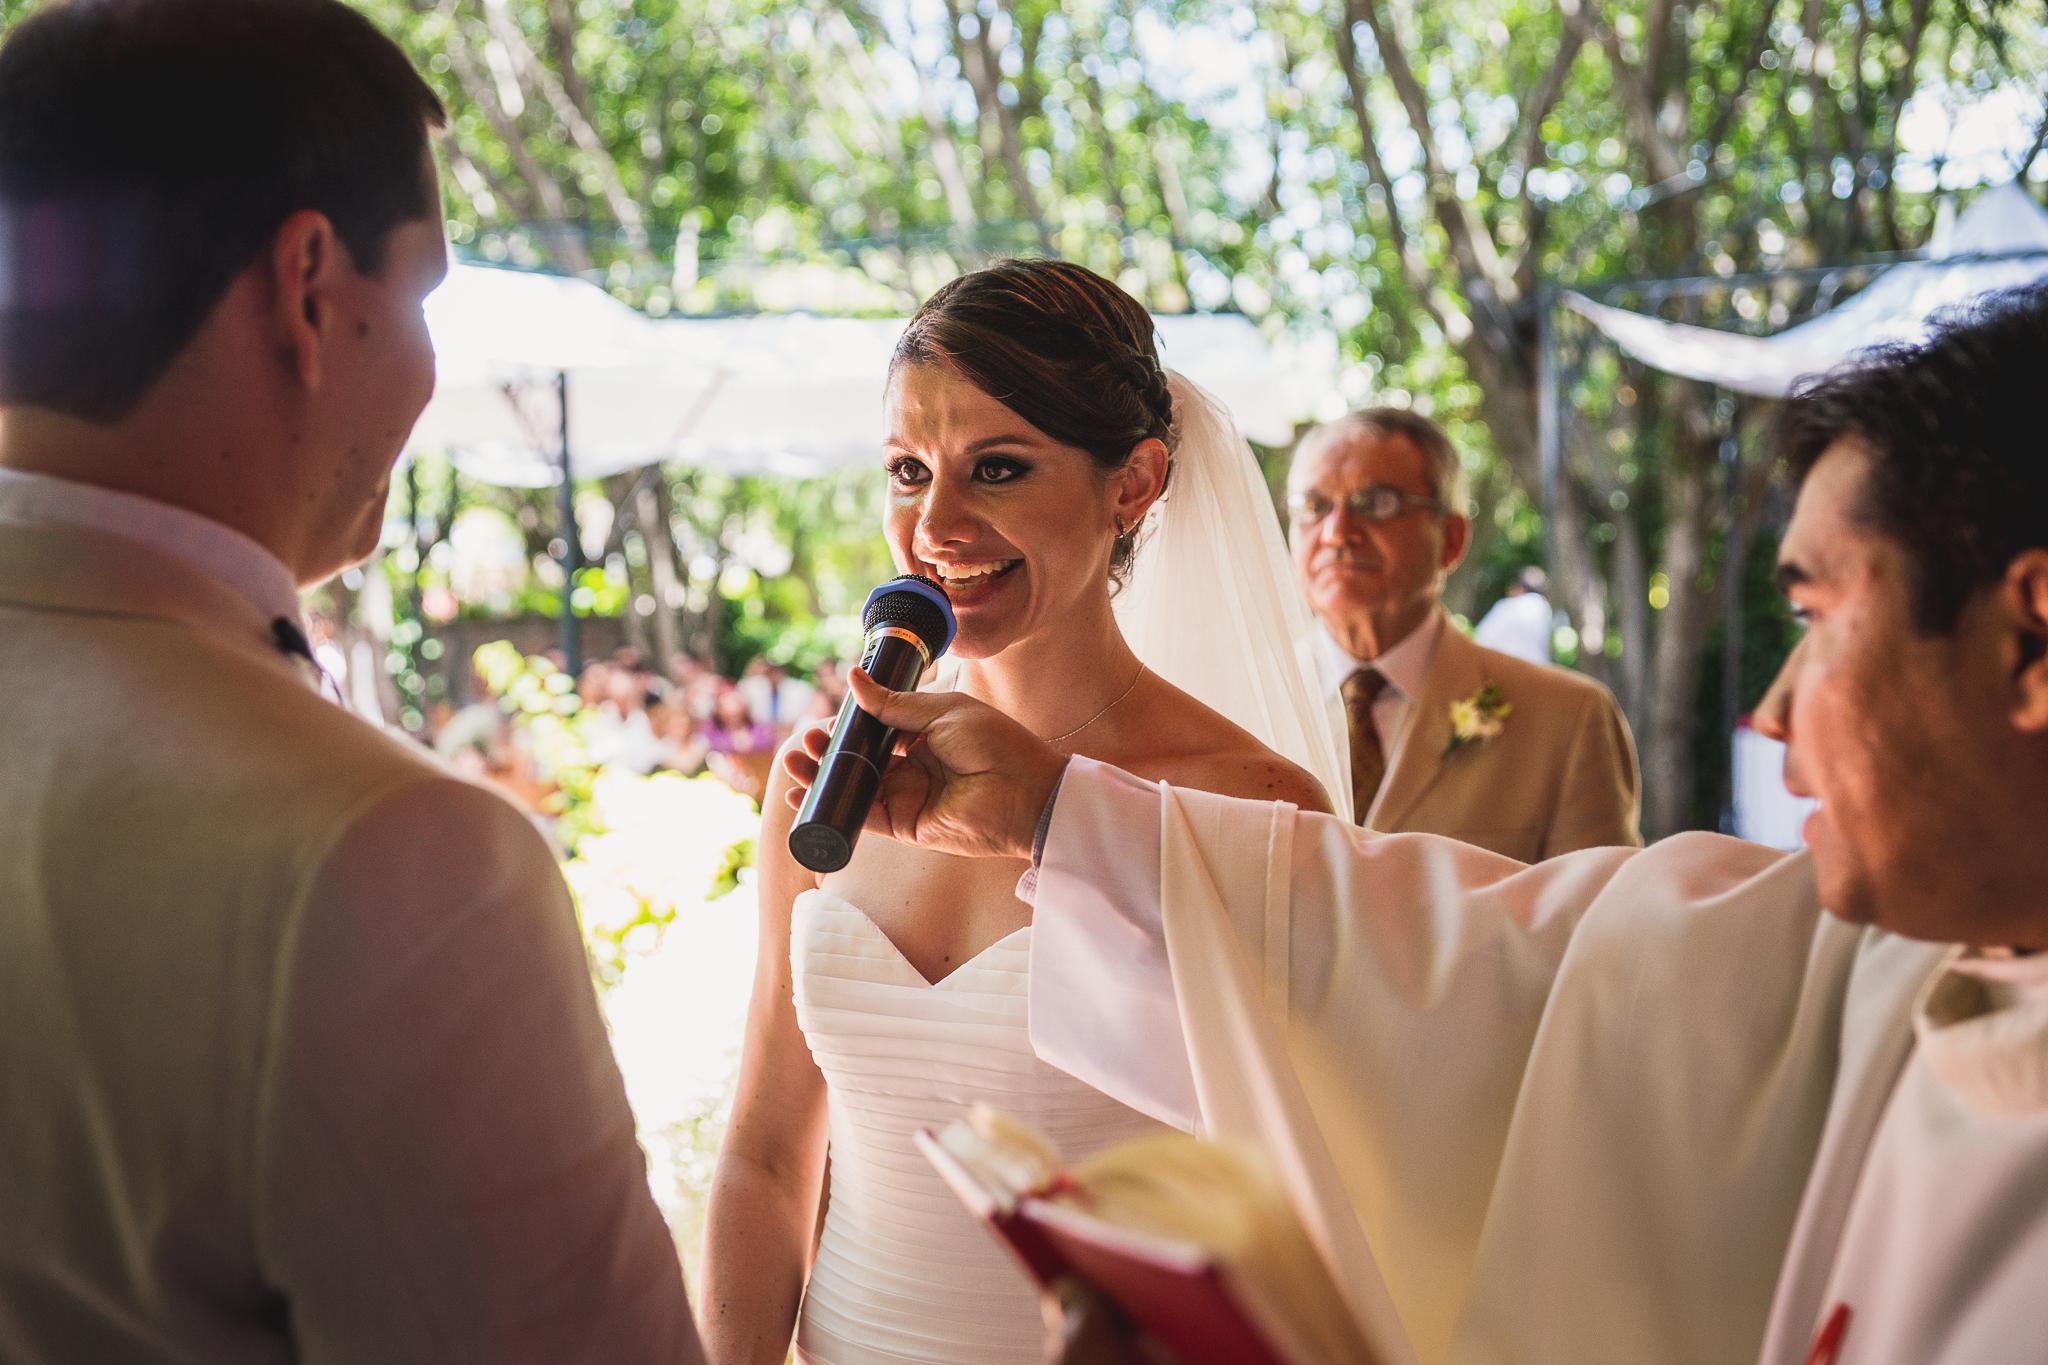 wedding-photography-mexico-quinta-rubelinas-39.jpg